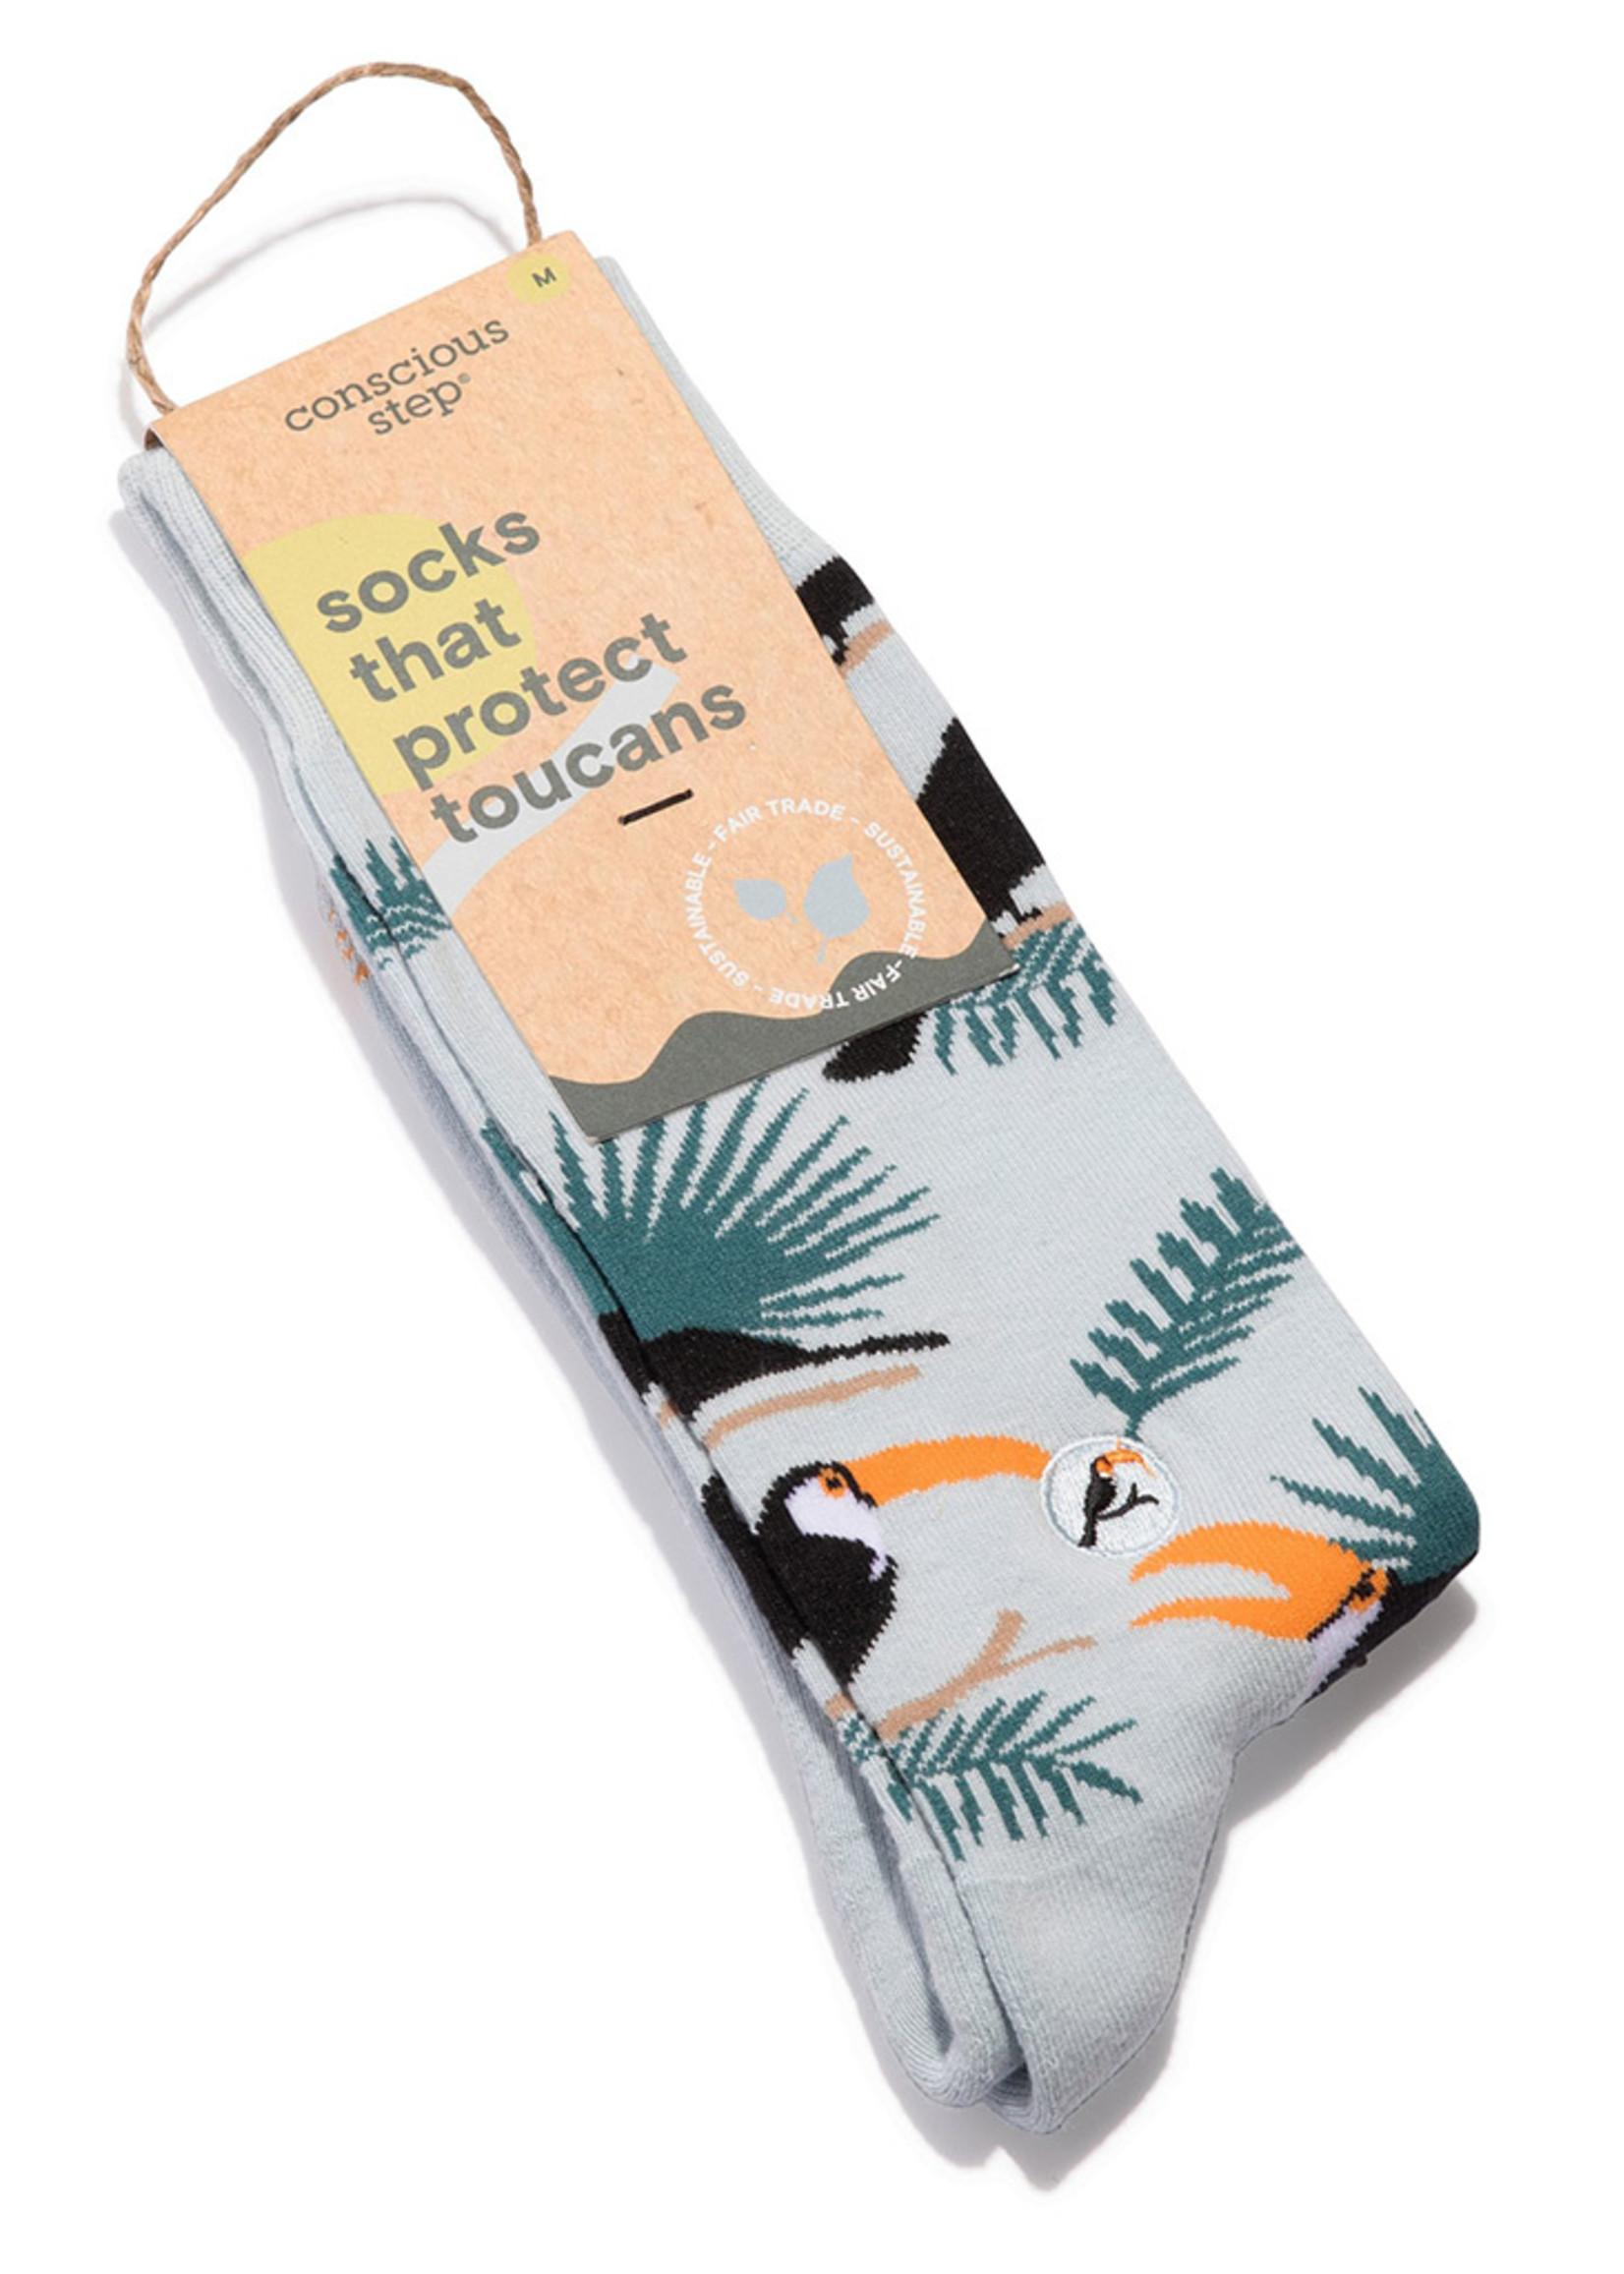 Conscious Step Men's Socks that Protect Toucans